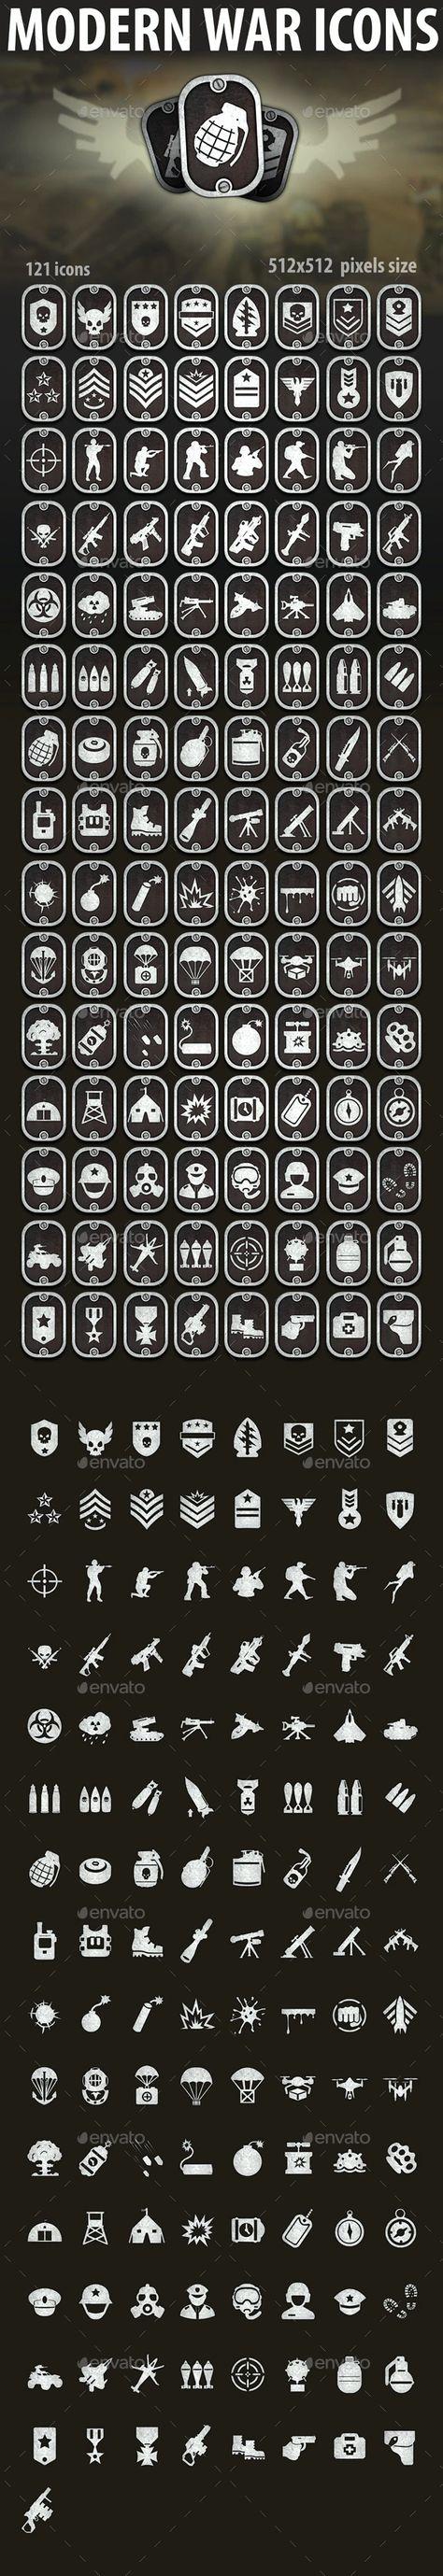 Modern War Icons